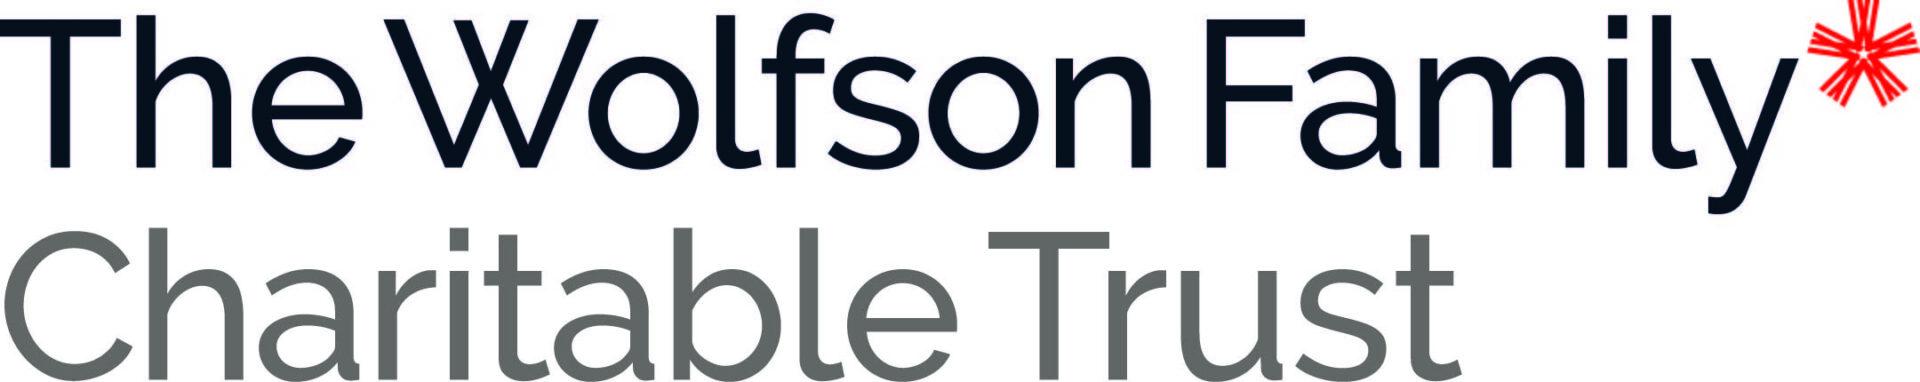 The Wolfson Family Charitable Trust Logo